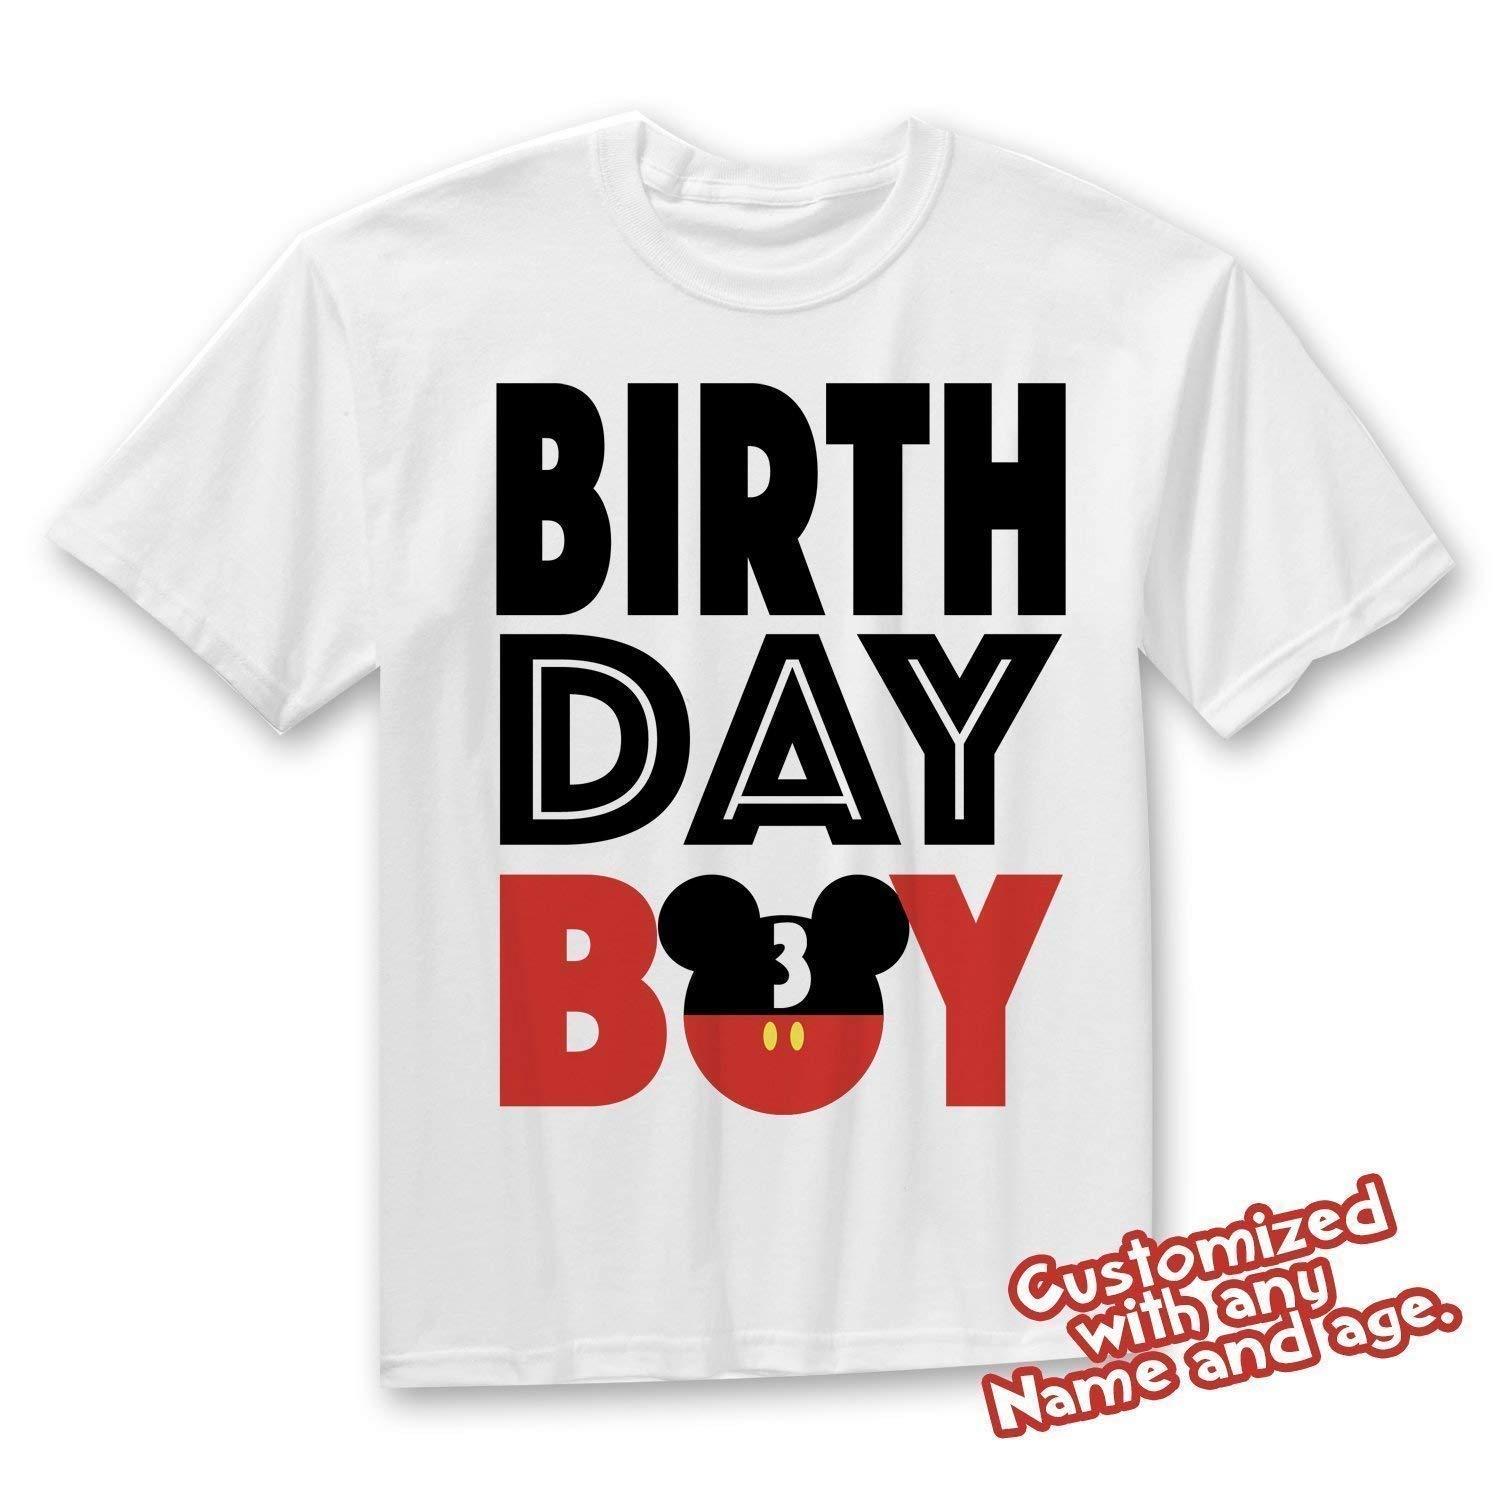 f83247235 Amazon.com  Matching Disney Family Birthday Boy Tshirts - Mickey Minnie  Mouse Birthday Girl - Disney Inspired - Matching Birthday Shirts  Handmade